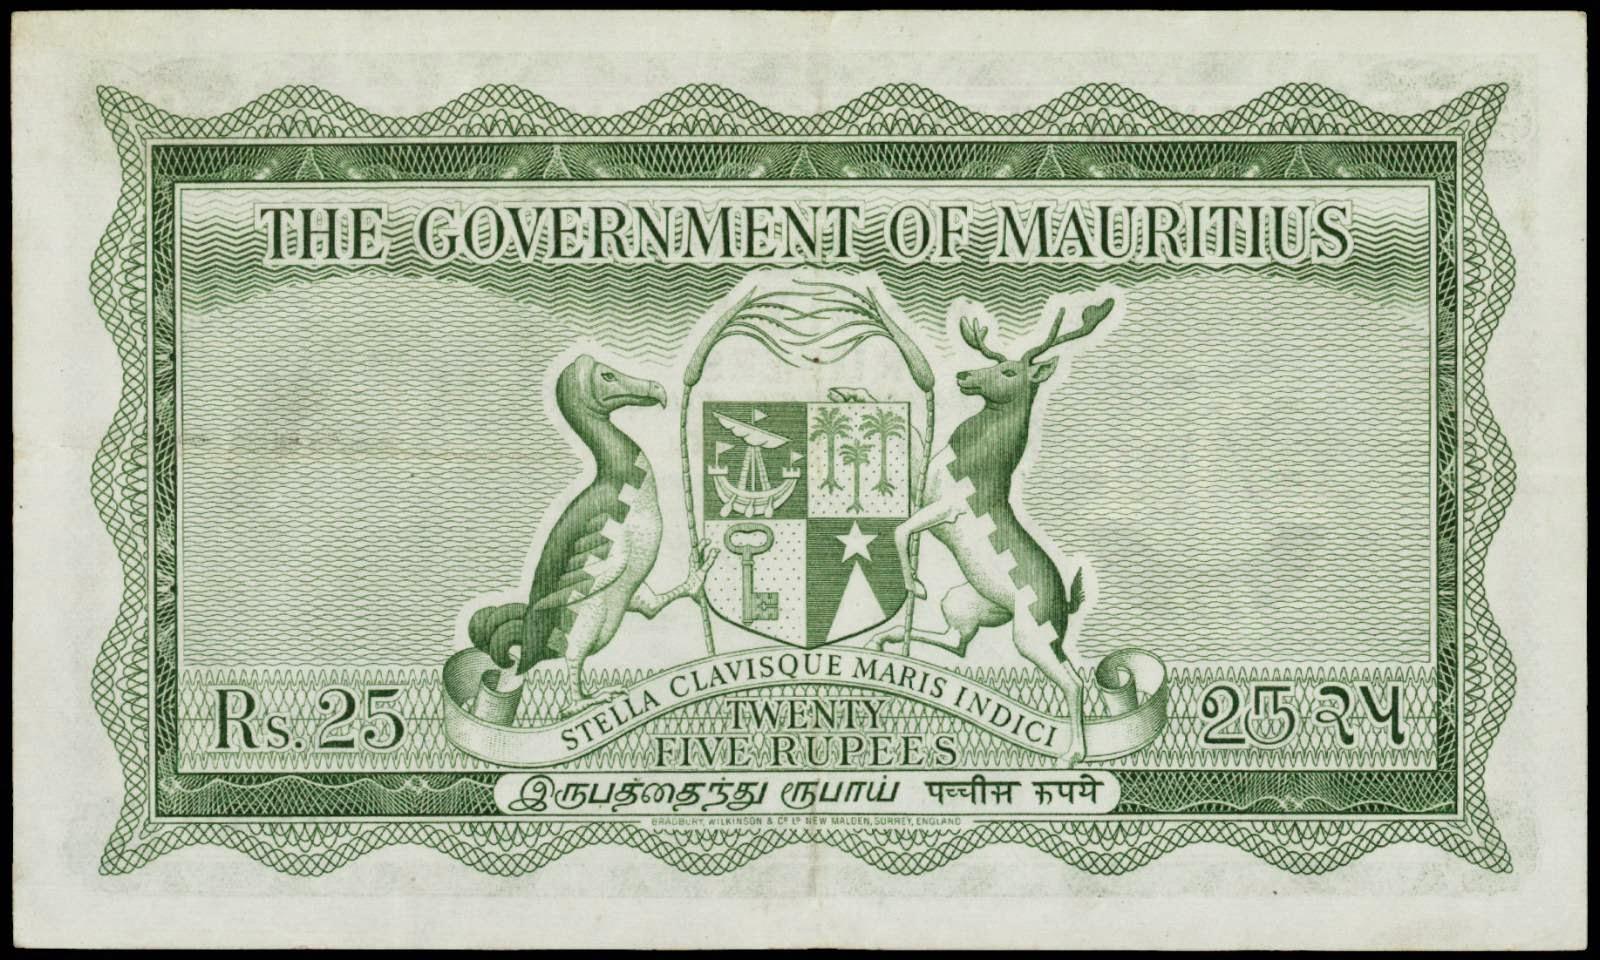 Mauritius Twenty Five Rupees